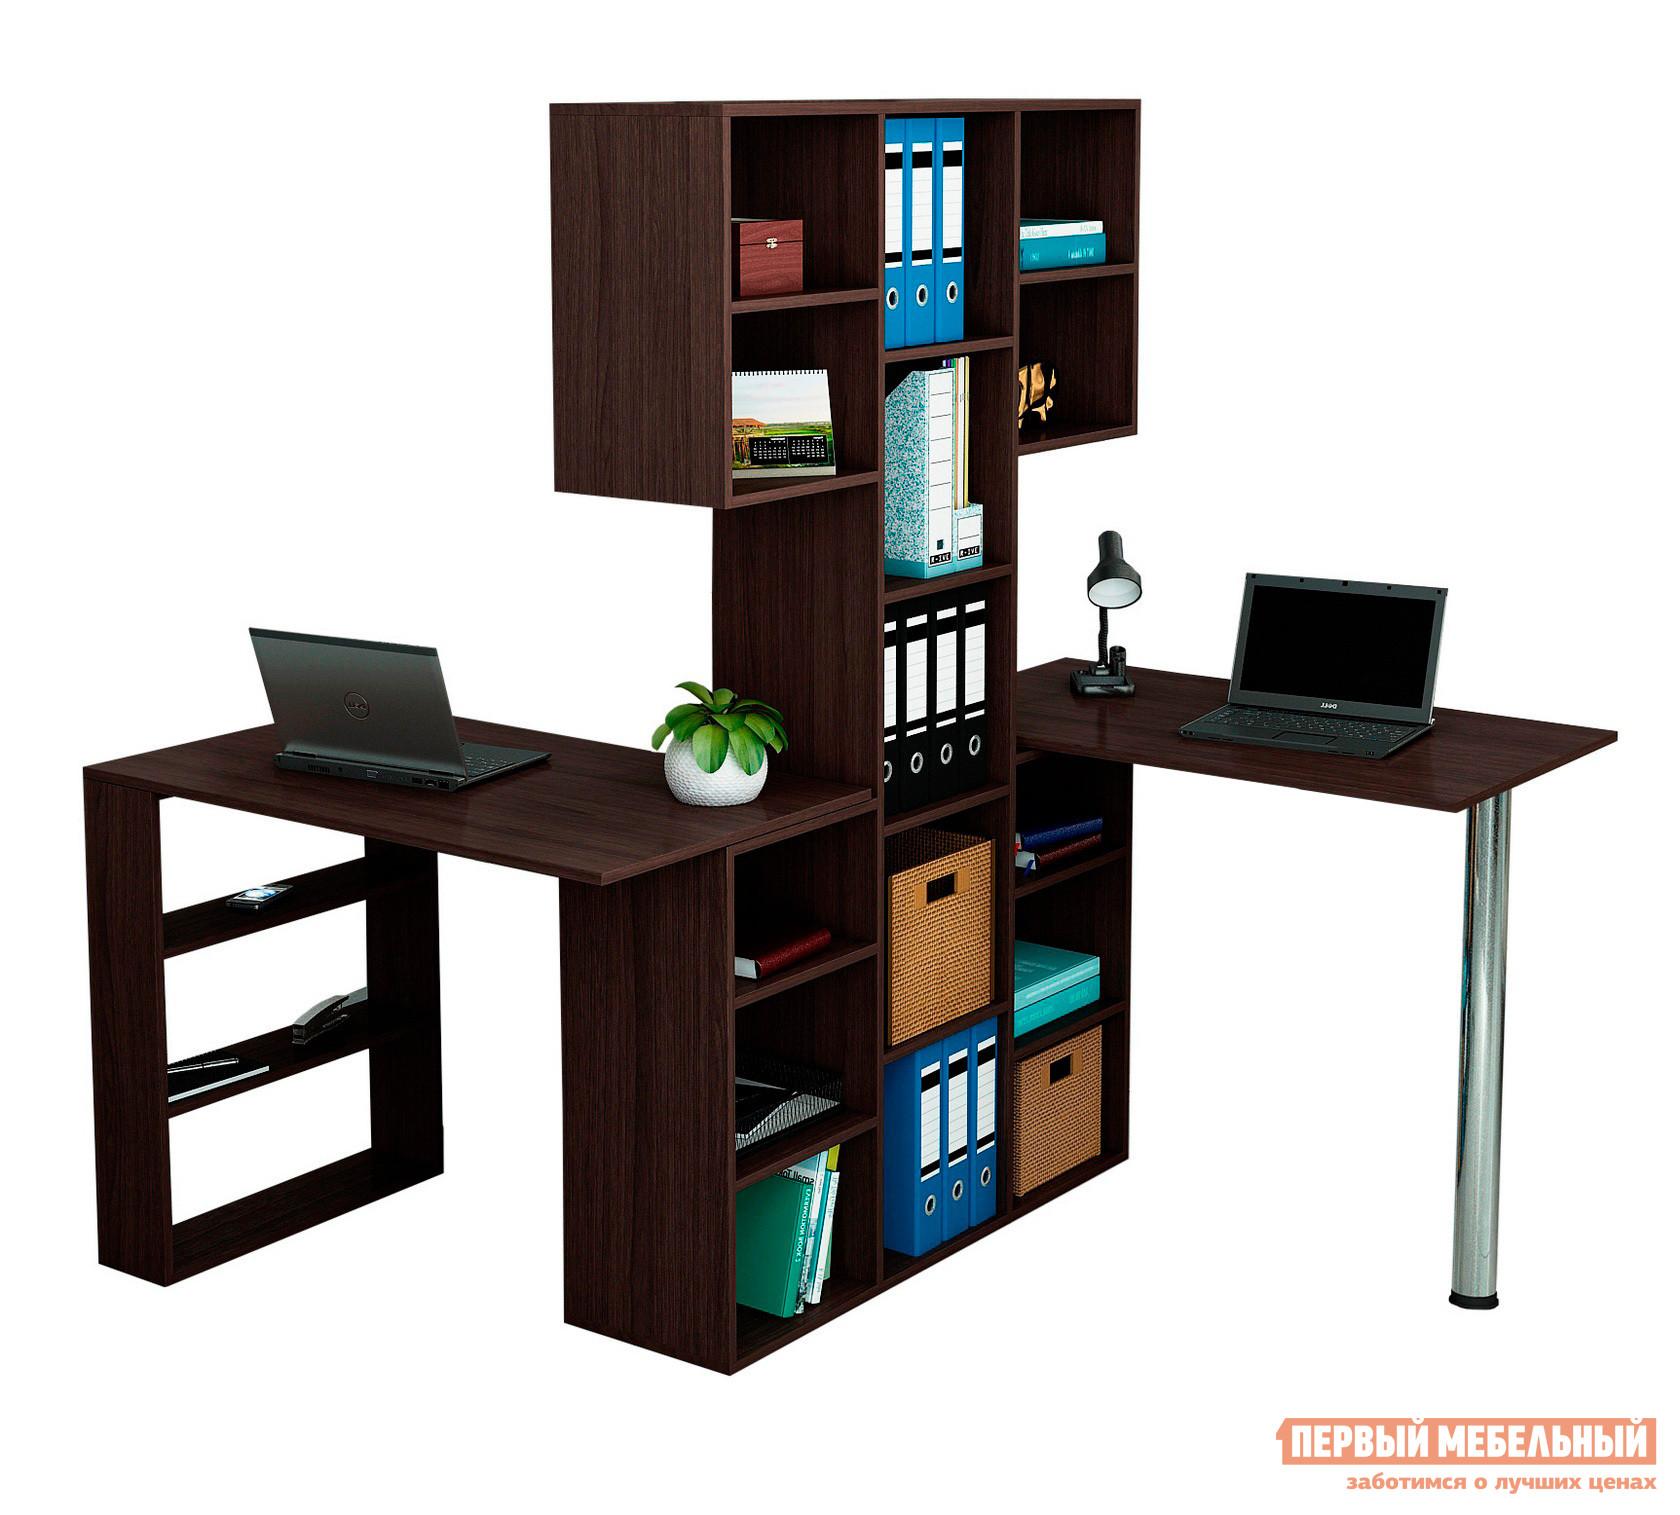 Компьютерный стол МФ Мастер Рикс-3 + Рикс-5 + Рикс-6 Венге